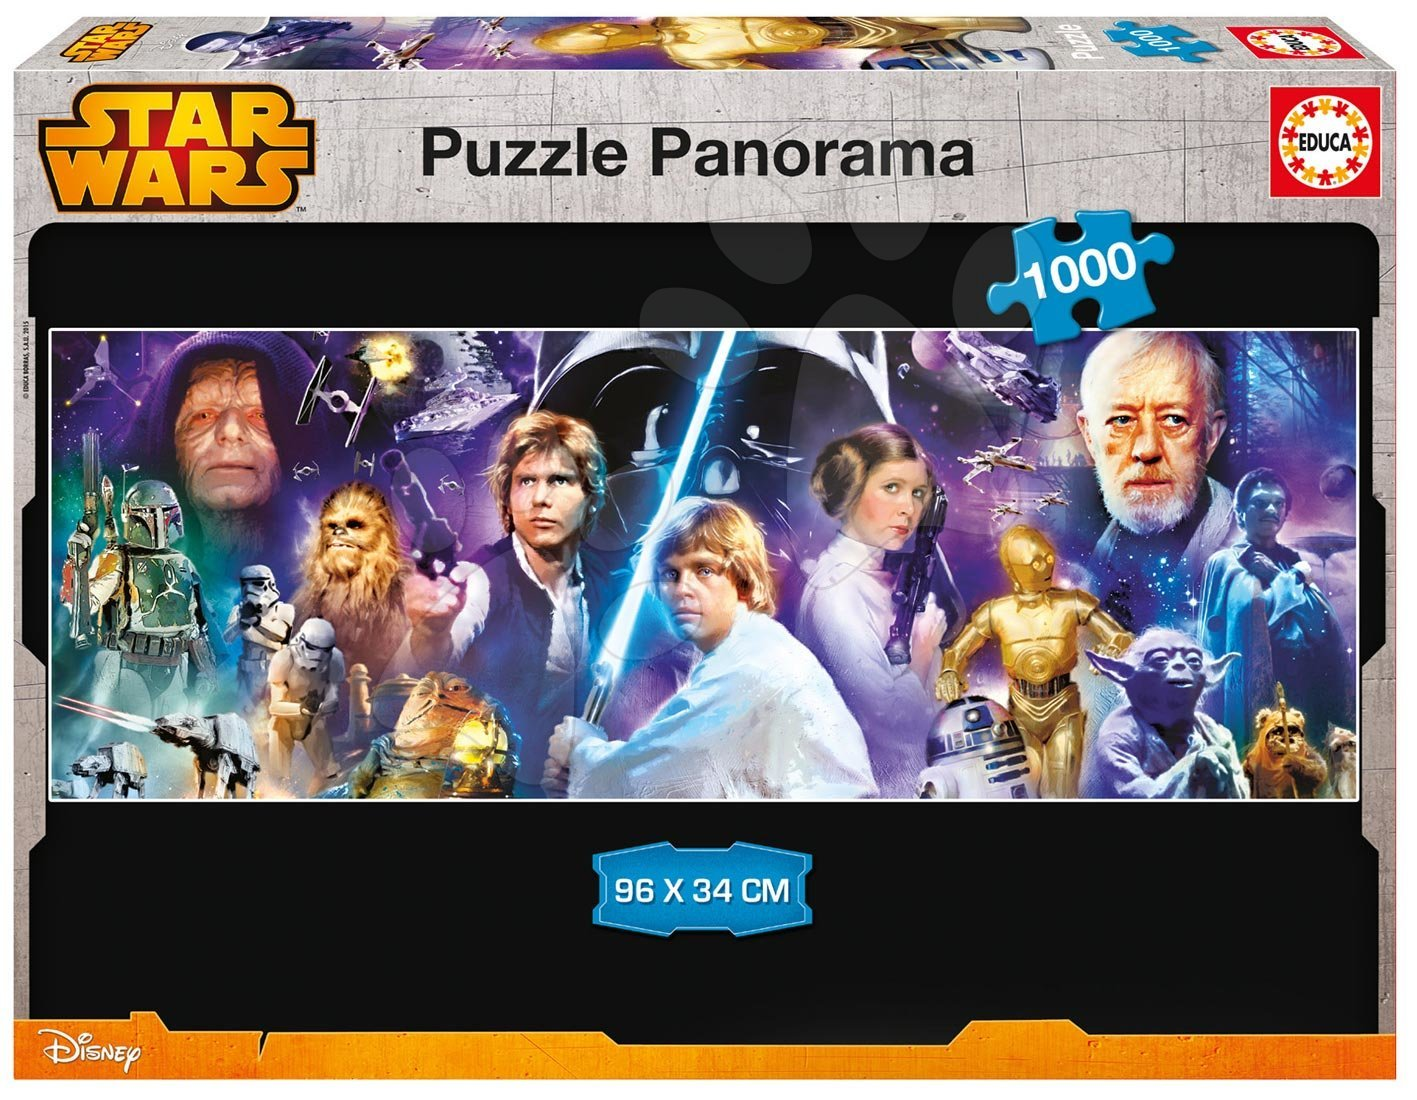 Puzzle Panorama Star Wars Educa 1000 dílů od 12 let